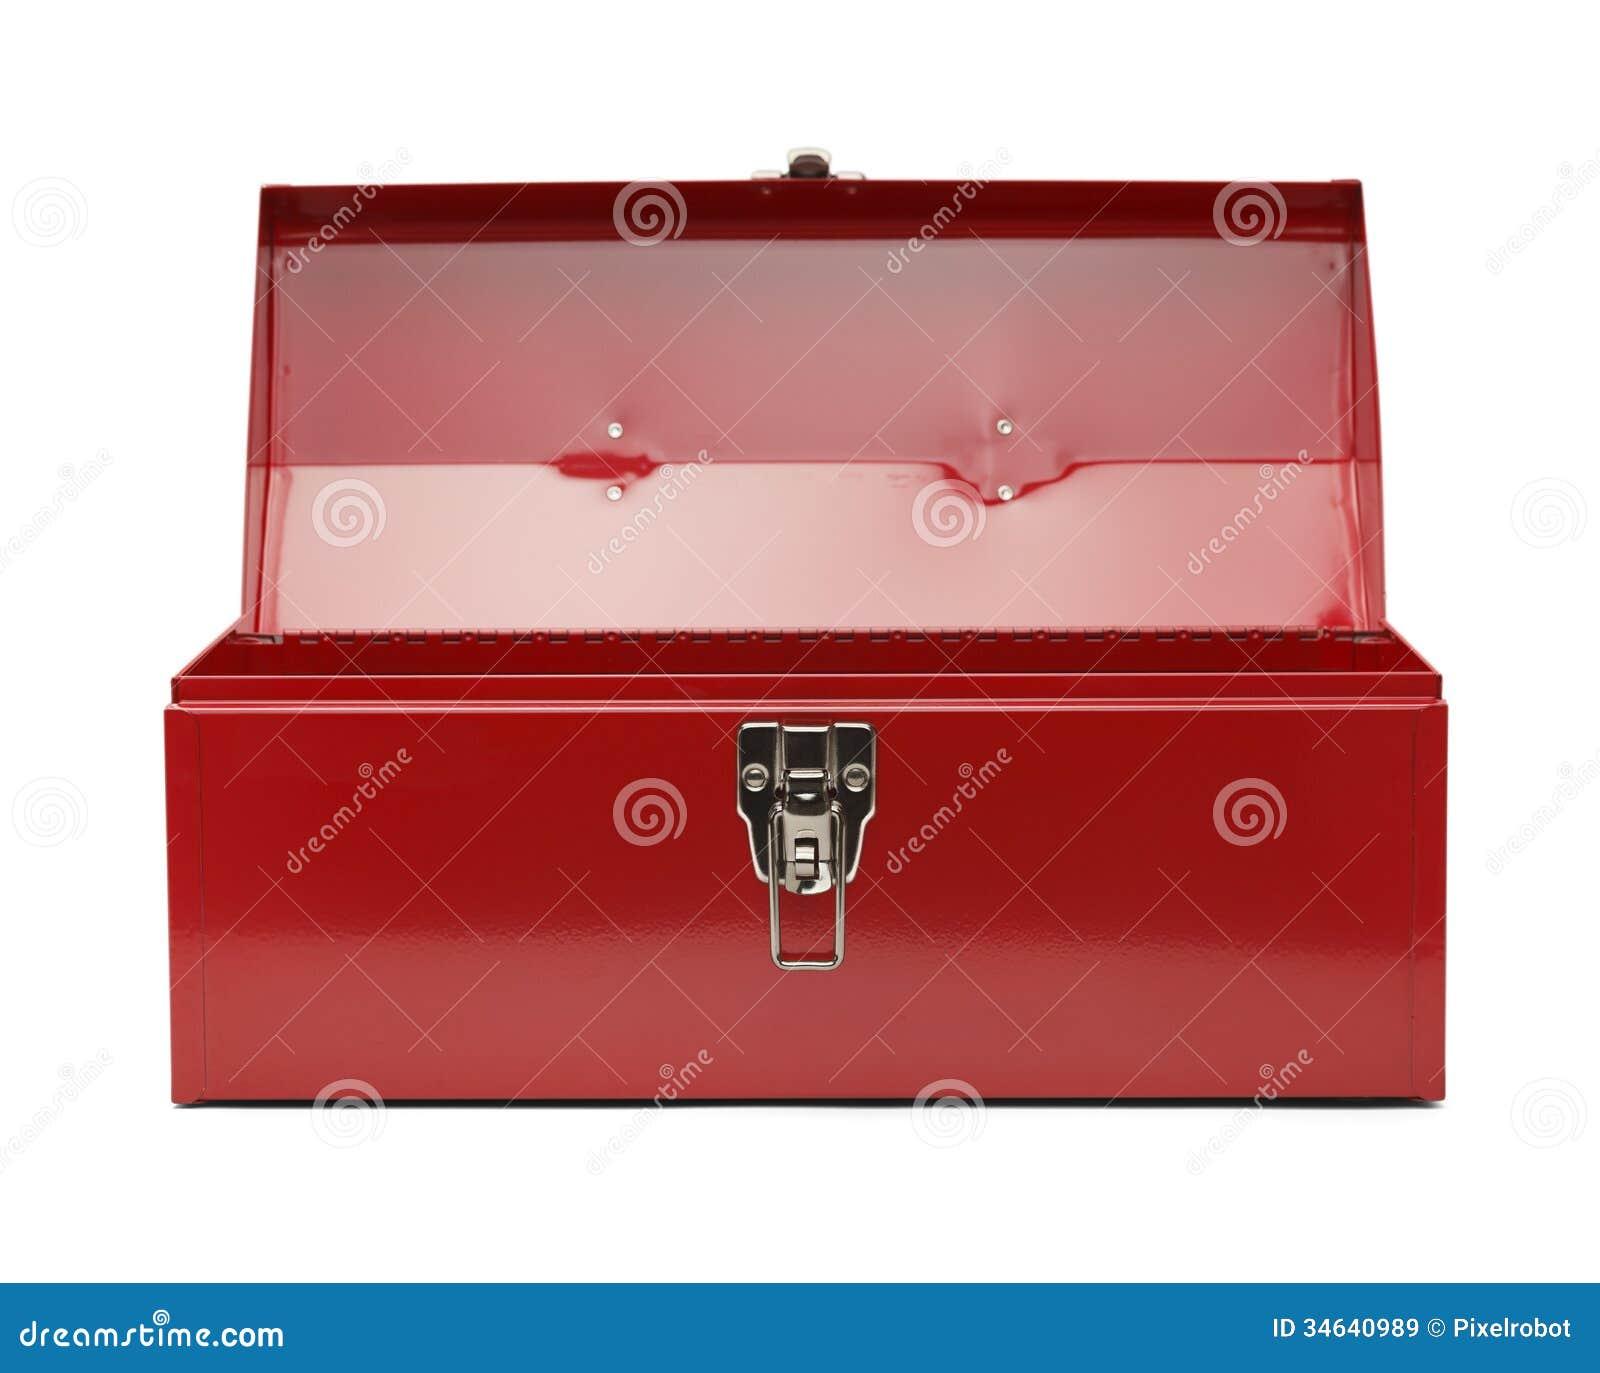 open toolbox clipart. royaltyfree stock photo download open tool box toolbox clipart